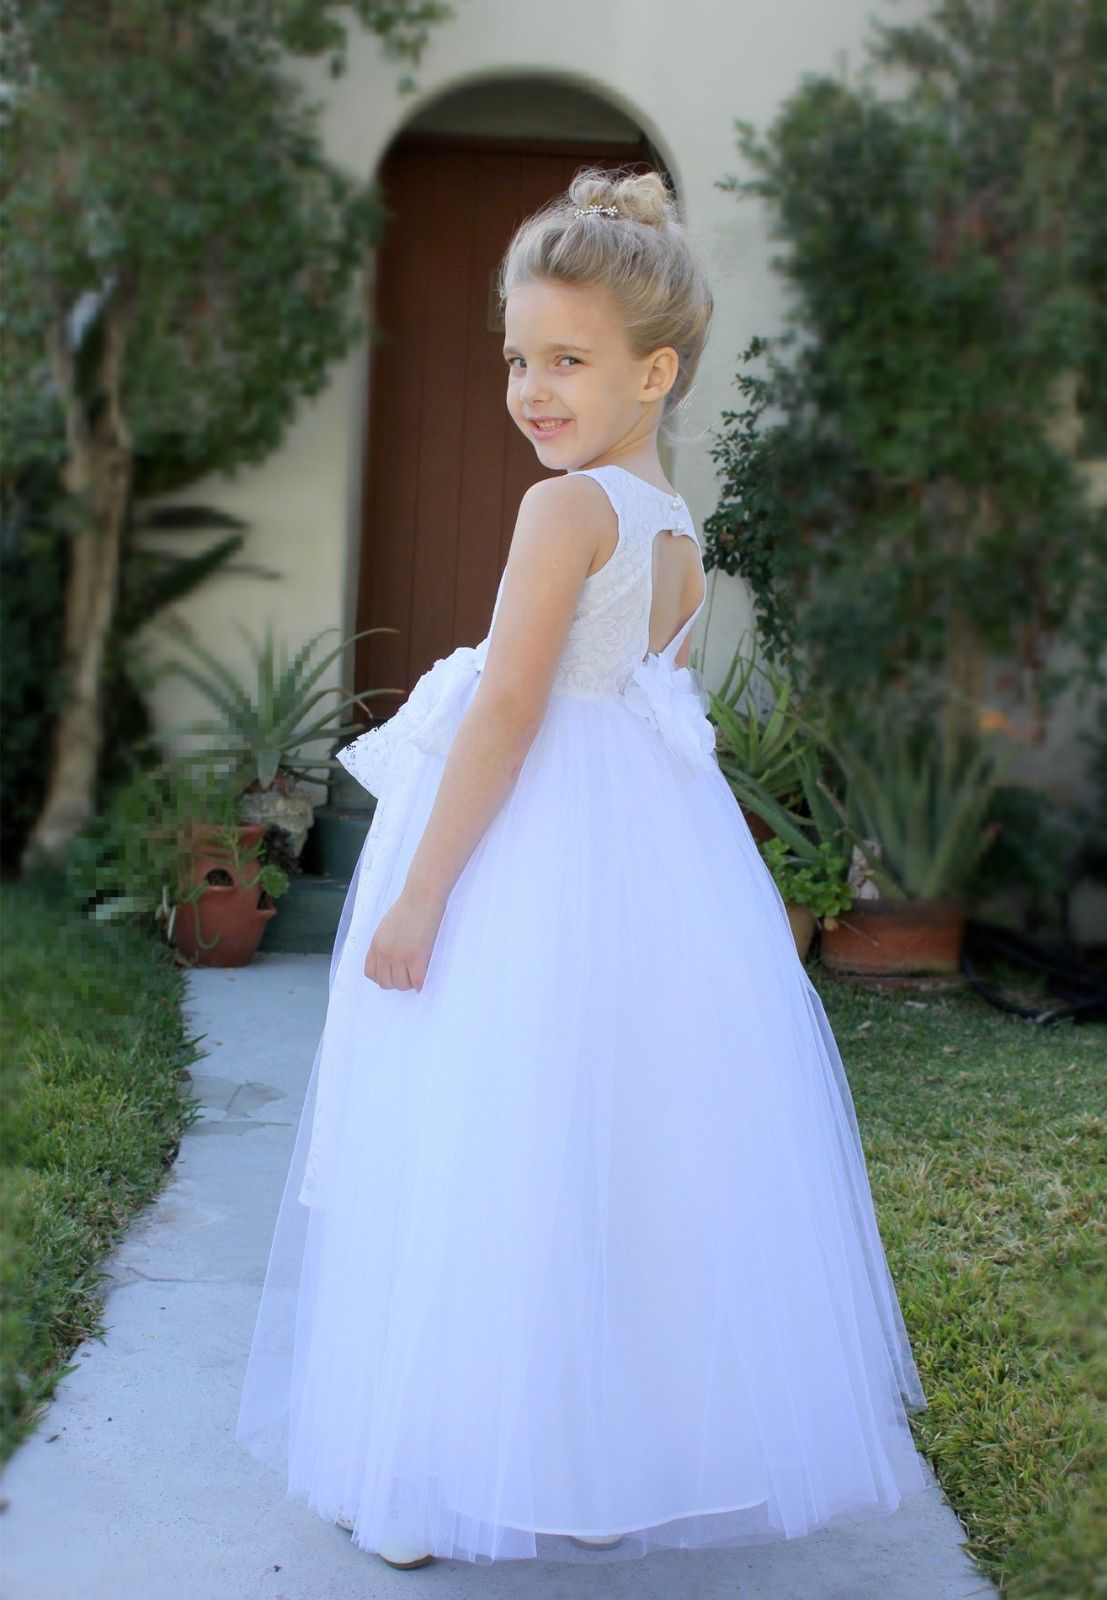 White Floral Lace Heart Cutout Flower Girl Dresses Christening Dresses 172T